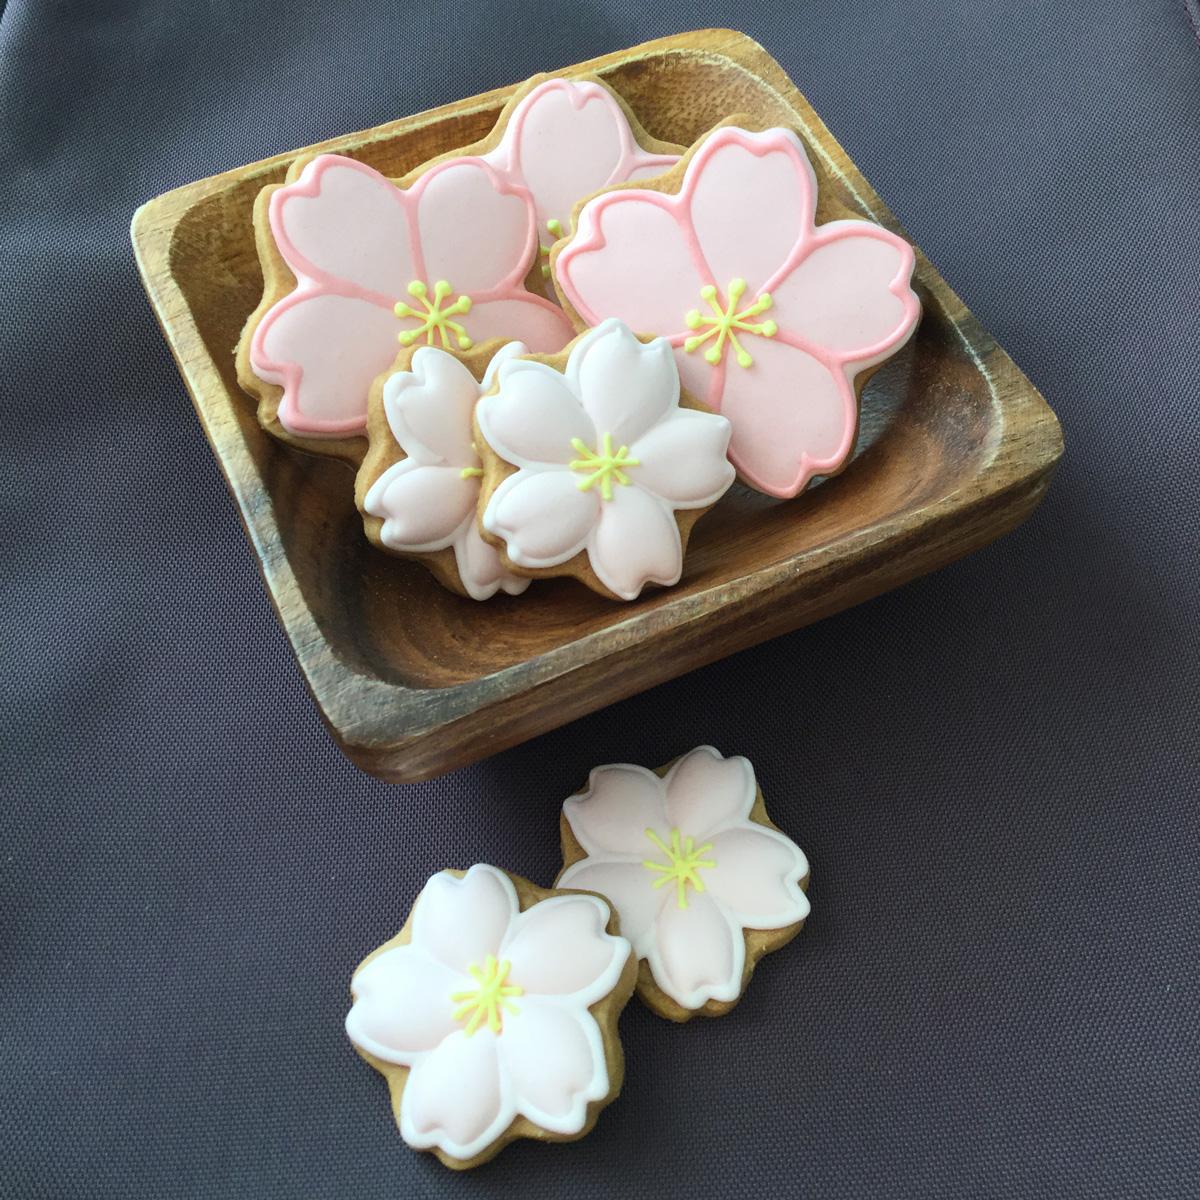 【Gallery】桜のアイシングクッキー2018